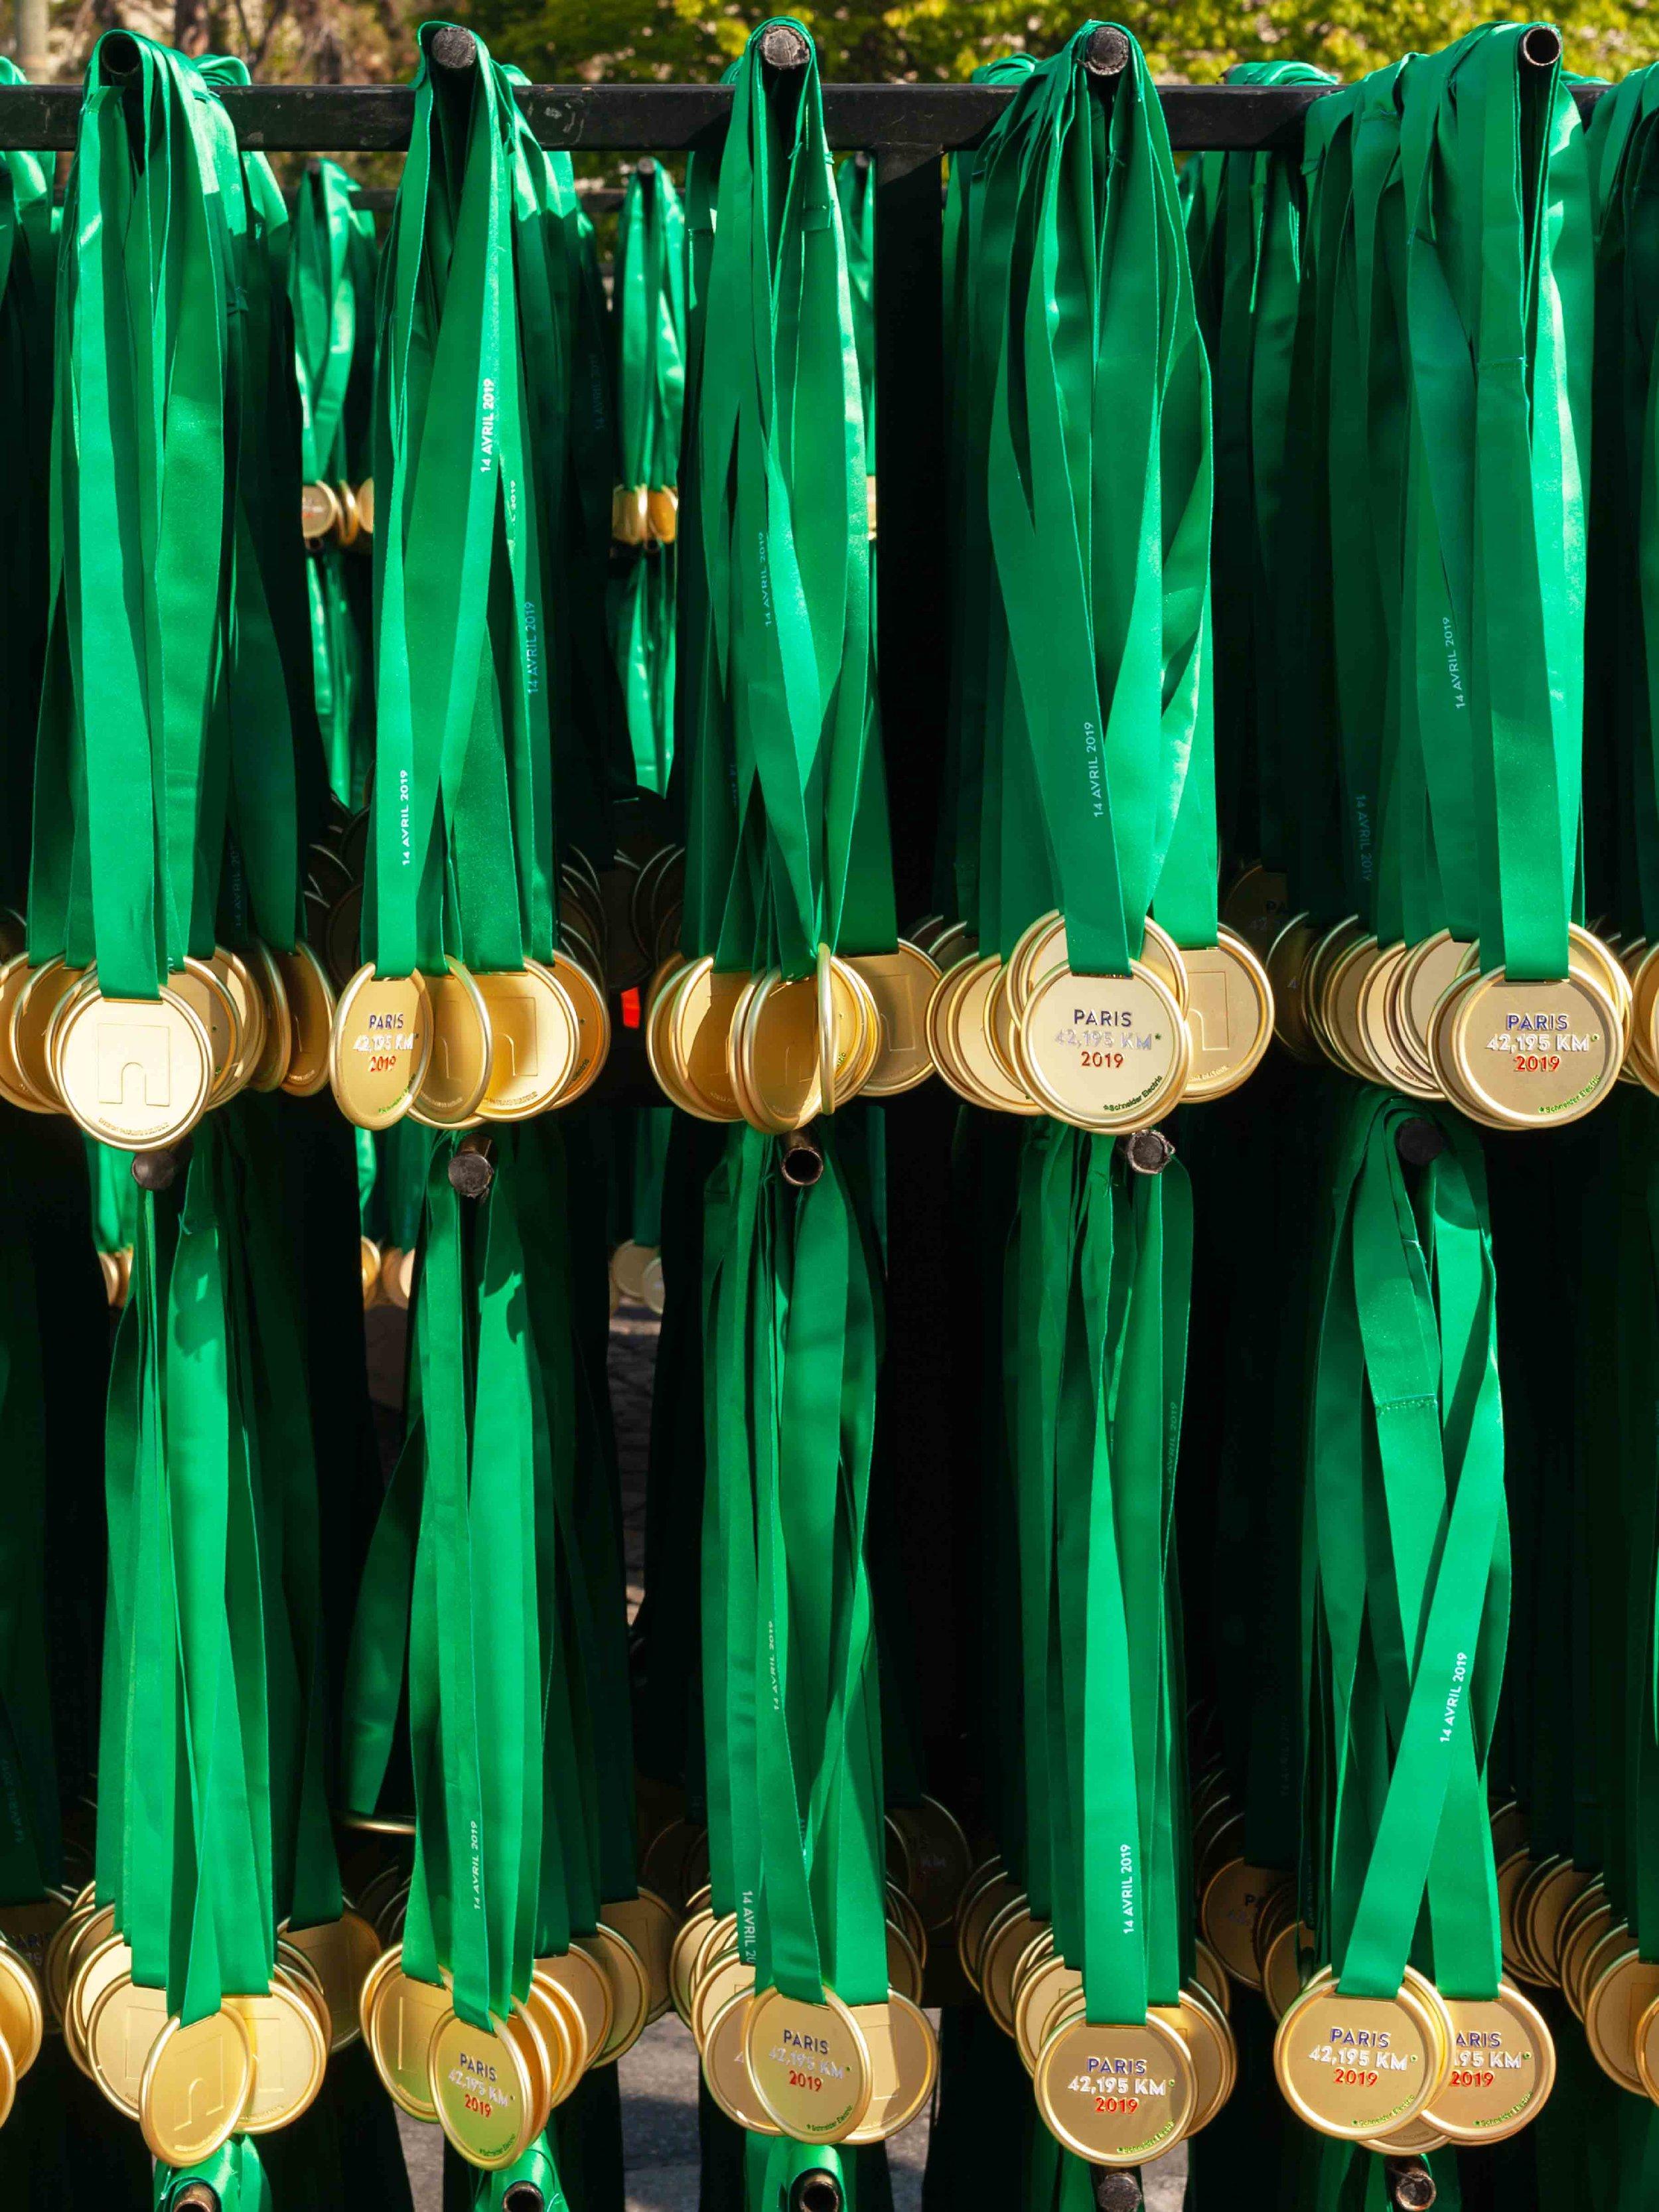 Marathondeparis-lamedaille-Pauline Deltour-09.jpg